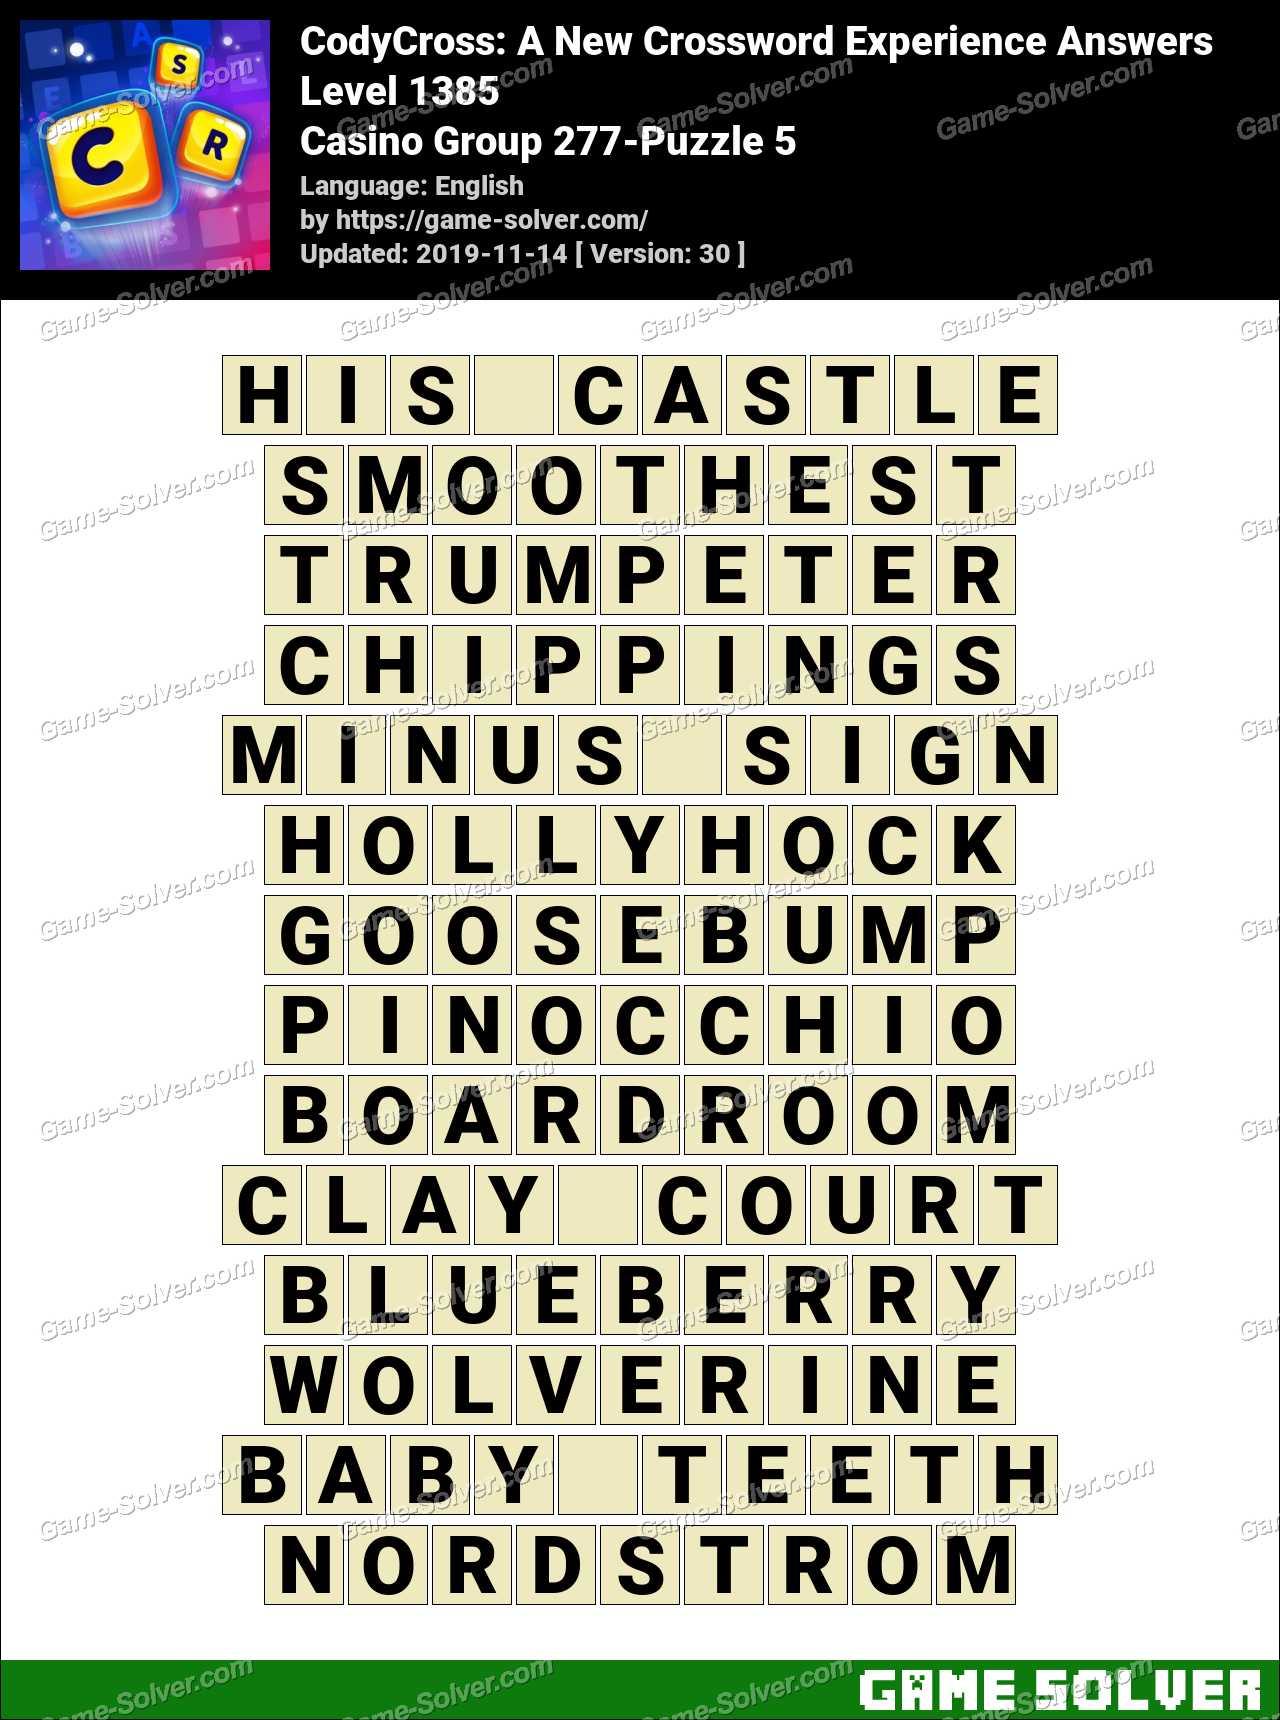 CodyCross Casino Group 277-Puzzle 5 Answers